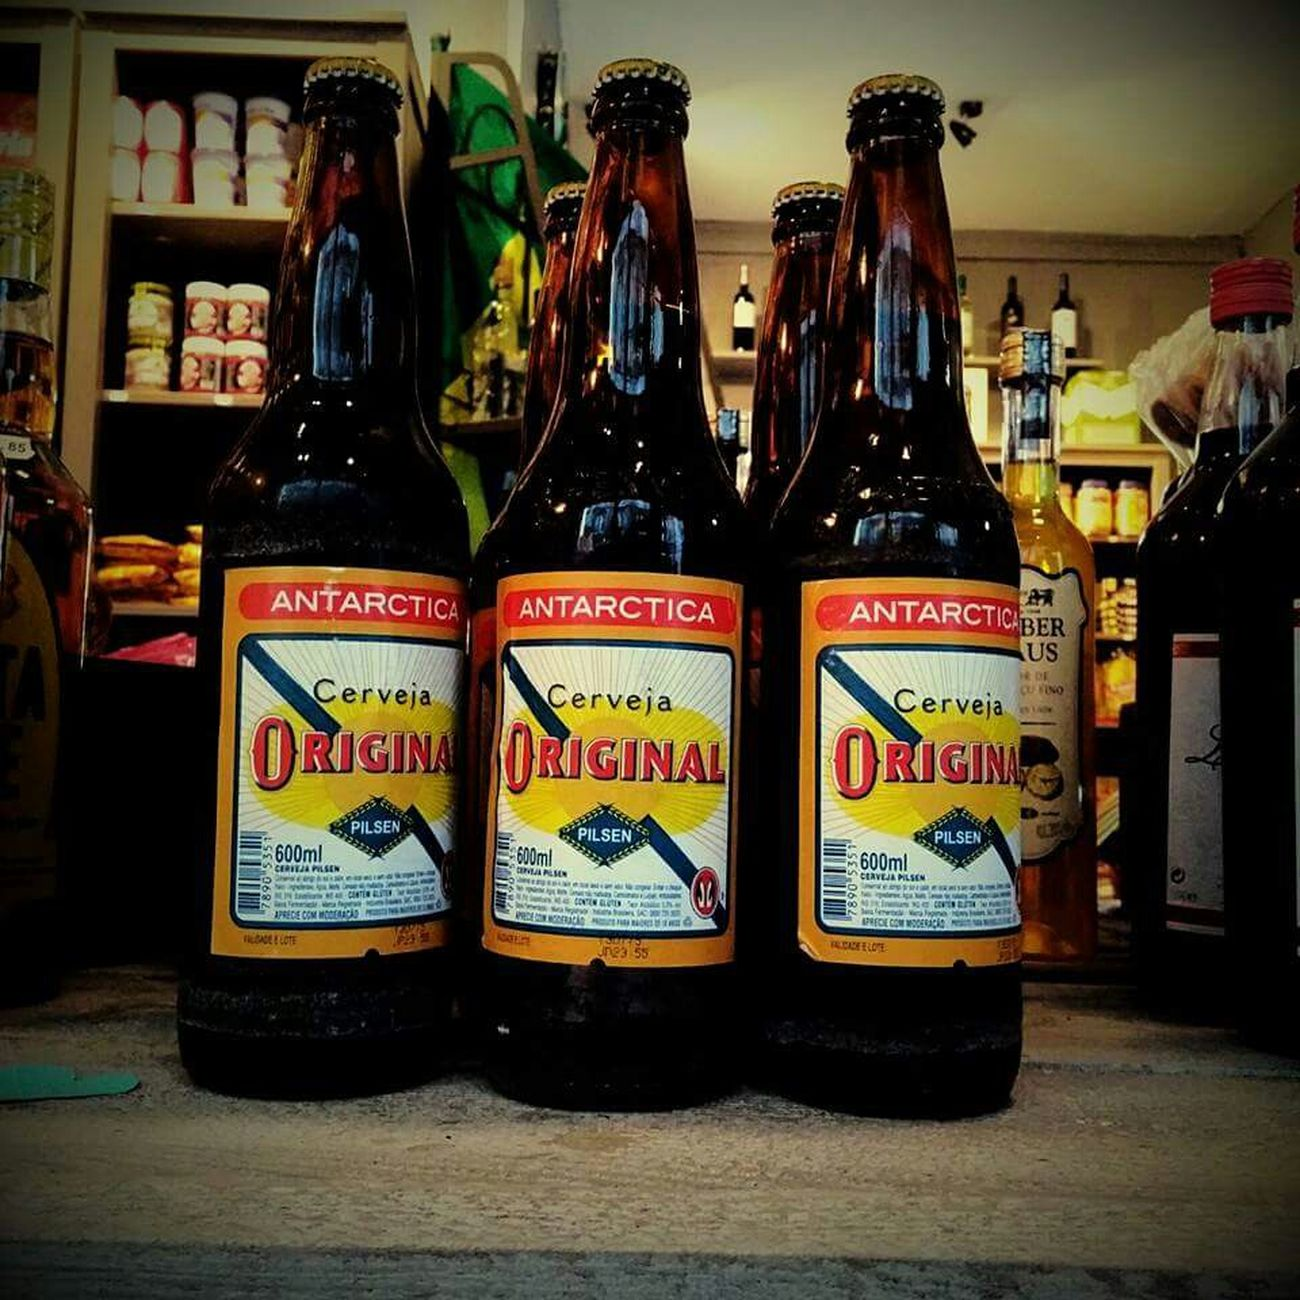 Bier Drinks Antarcticaoriginal Cerveja Cercejabrasileira